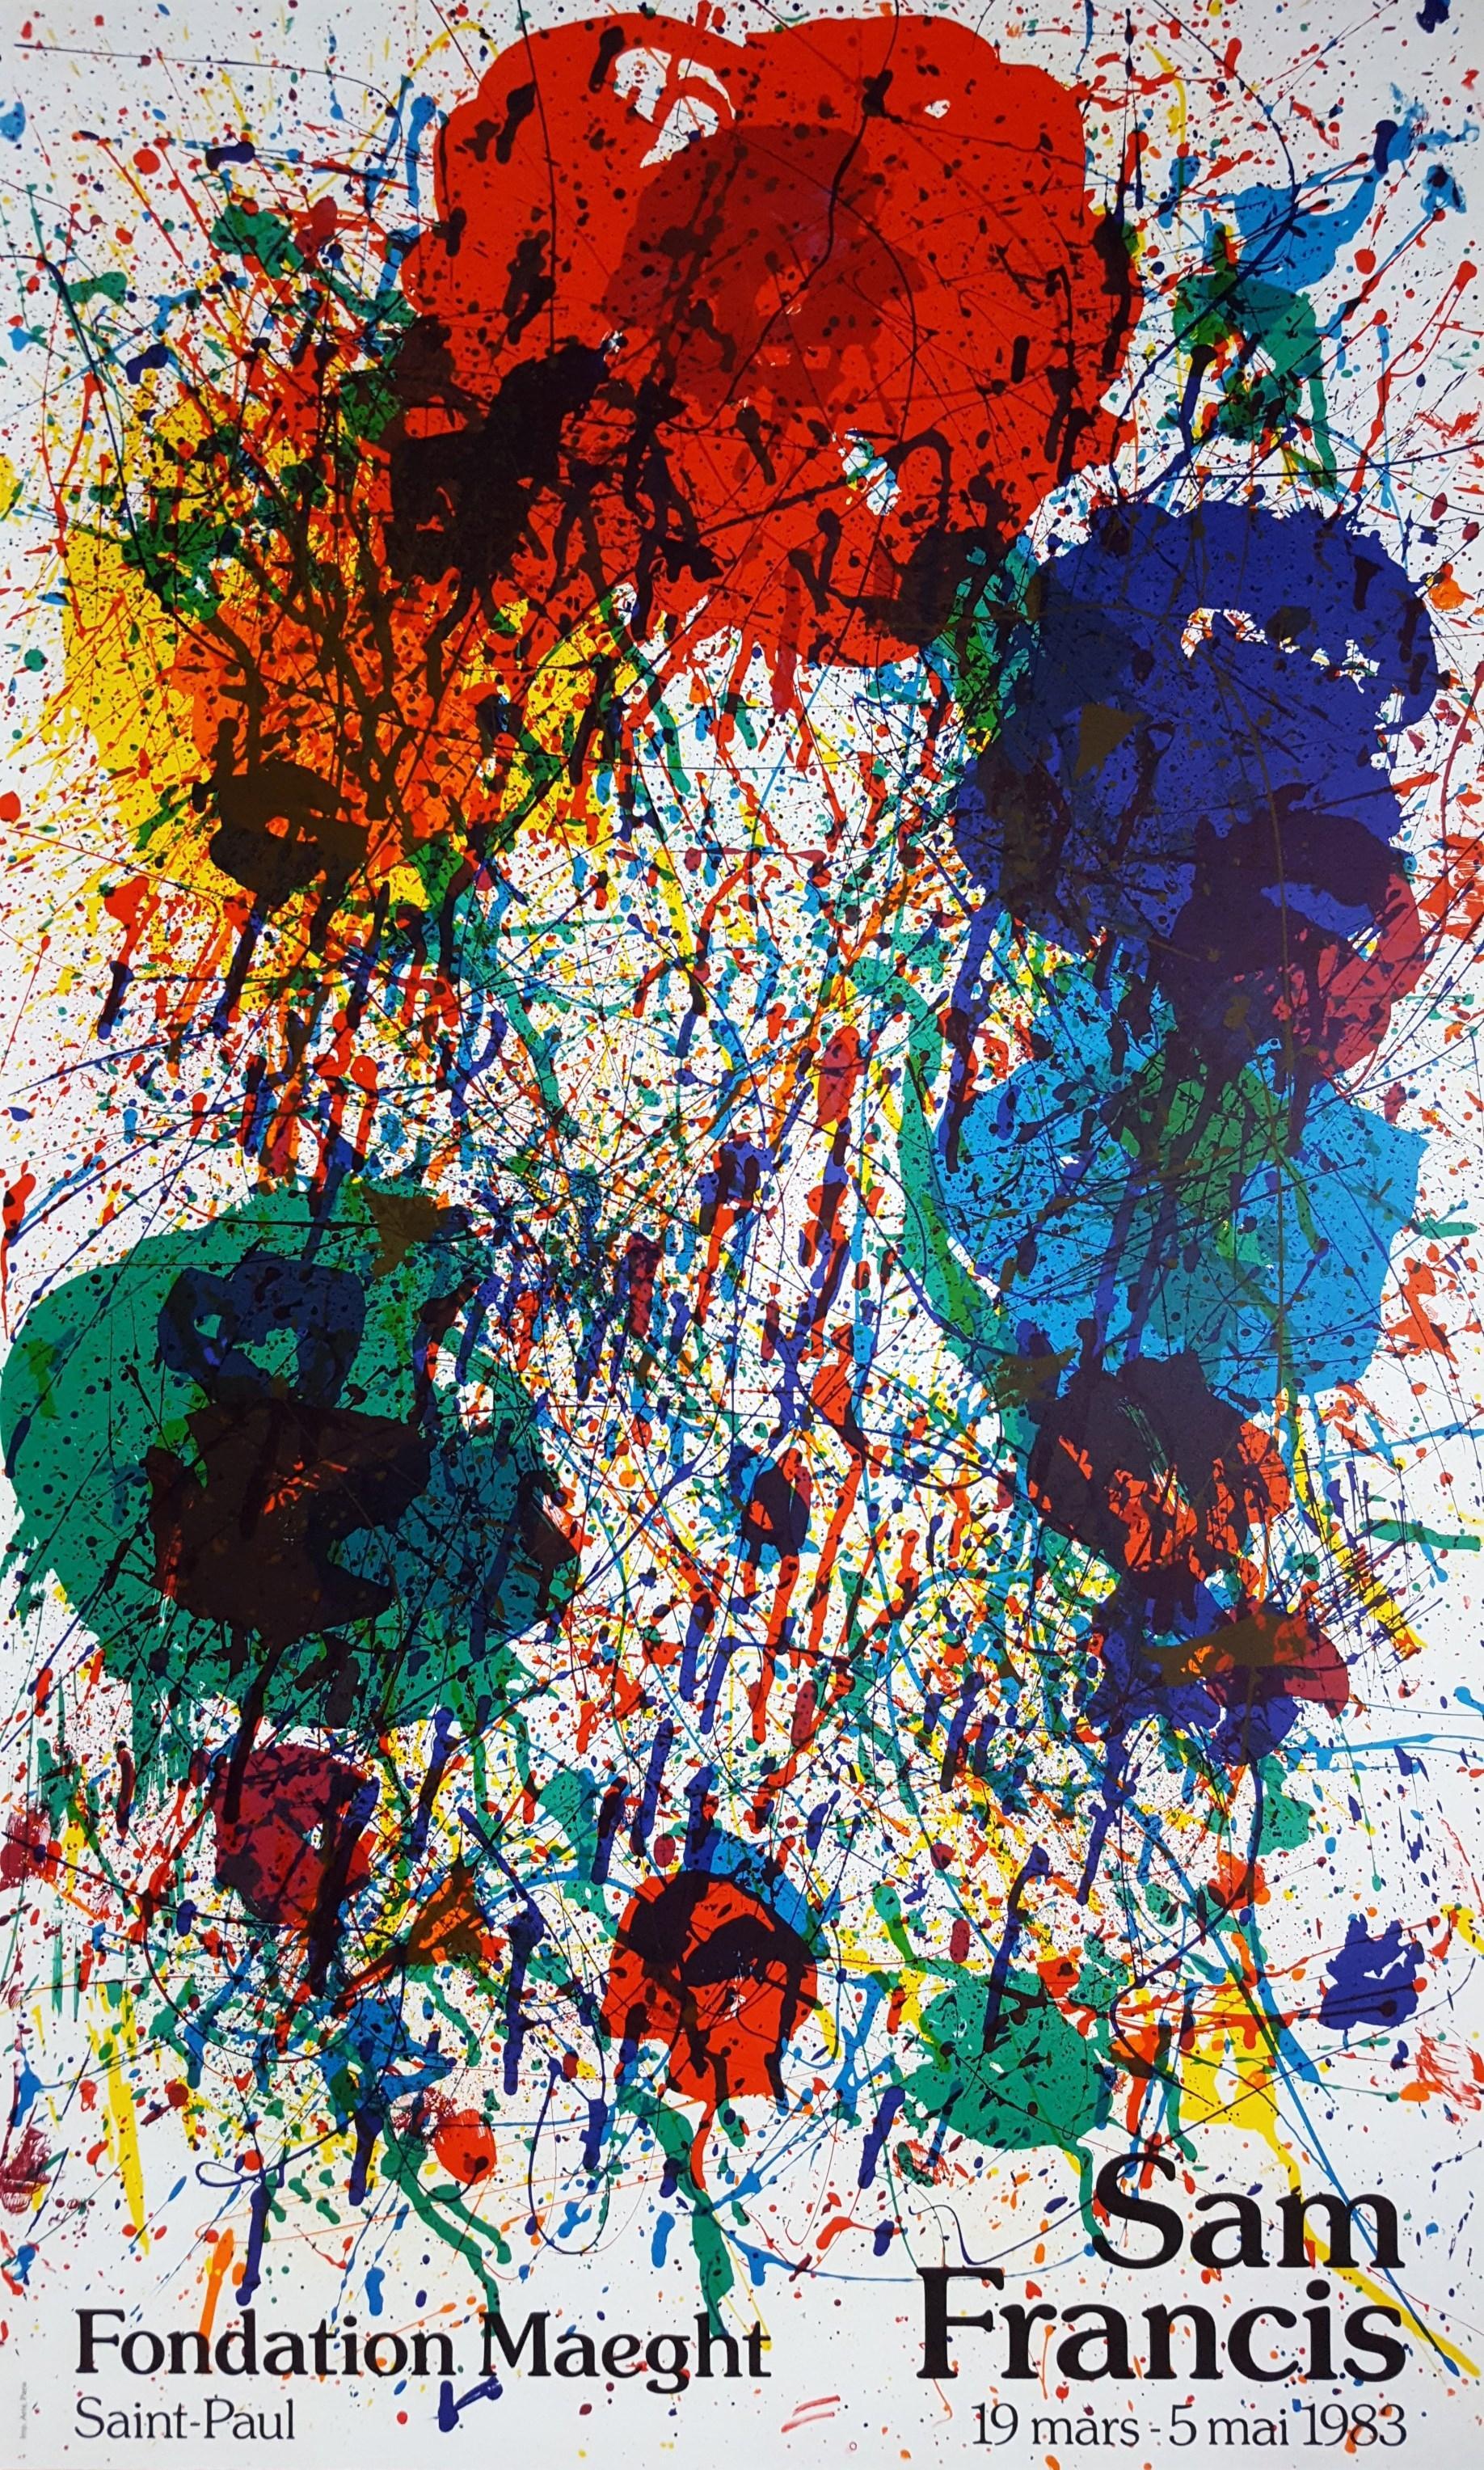 Untitled (Fondation Maeght)